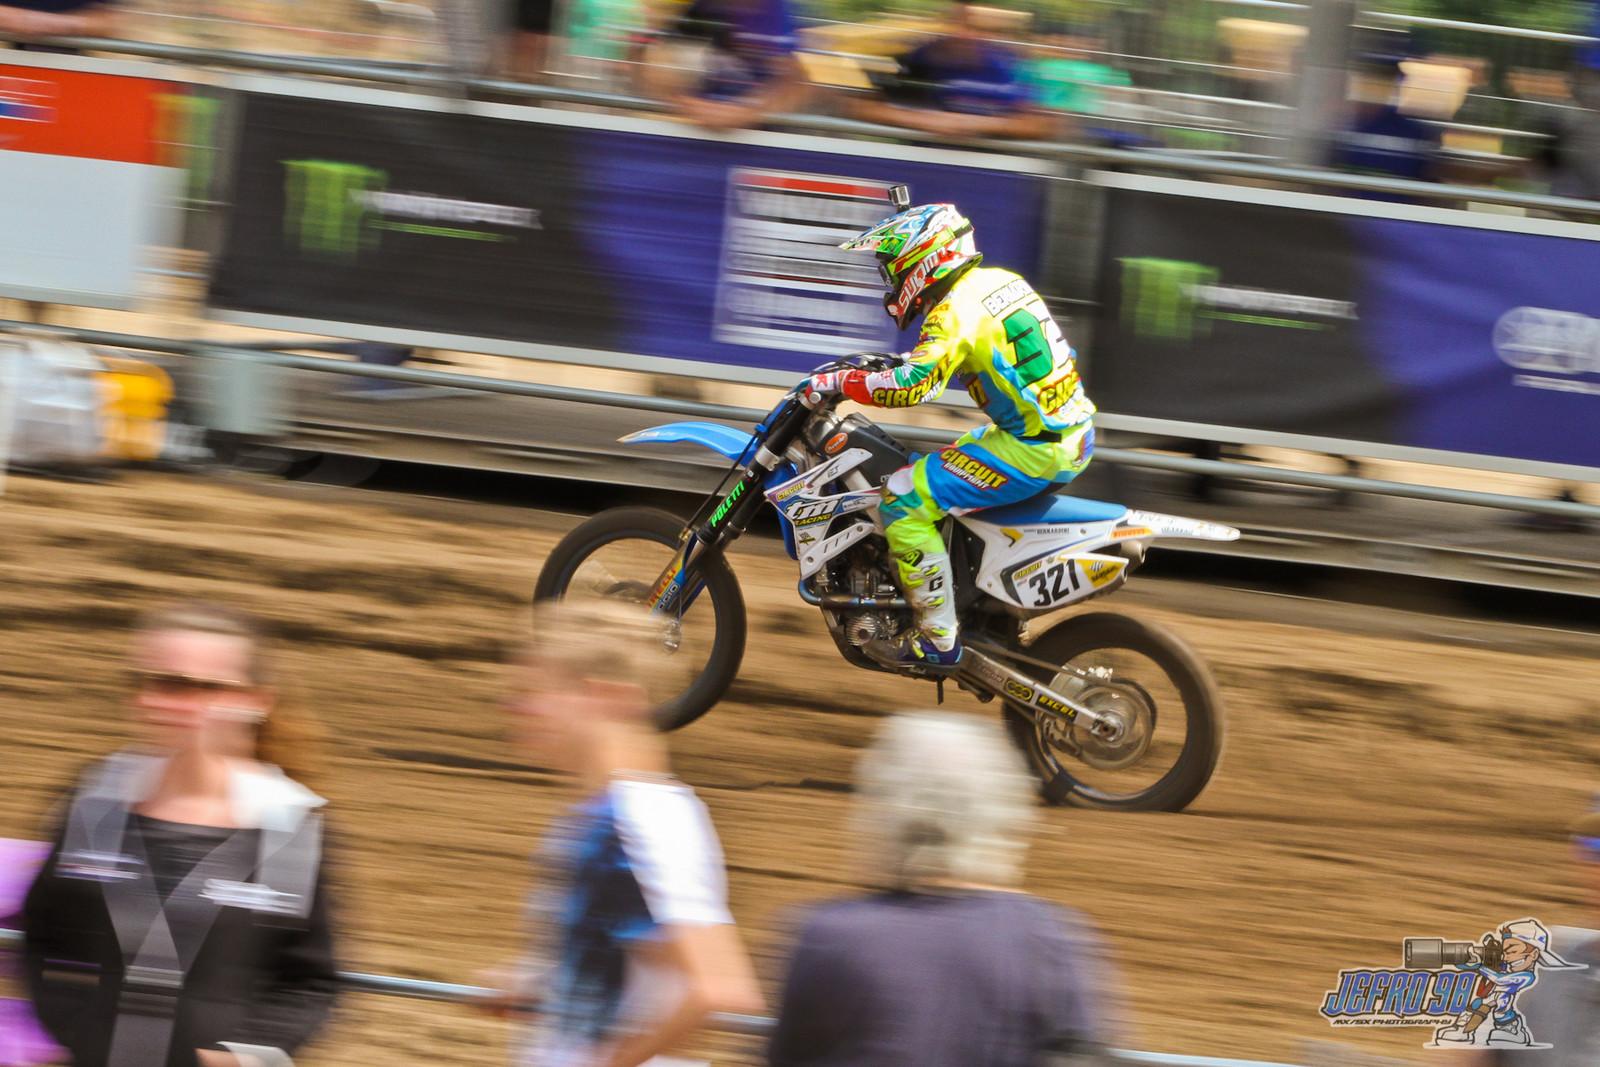 Samuele Bernardini - Photo Gallery: MXGP of Limburg - Motocross Pictures - Vital MX